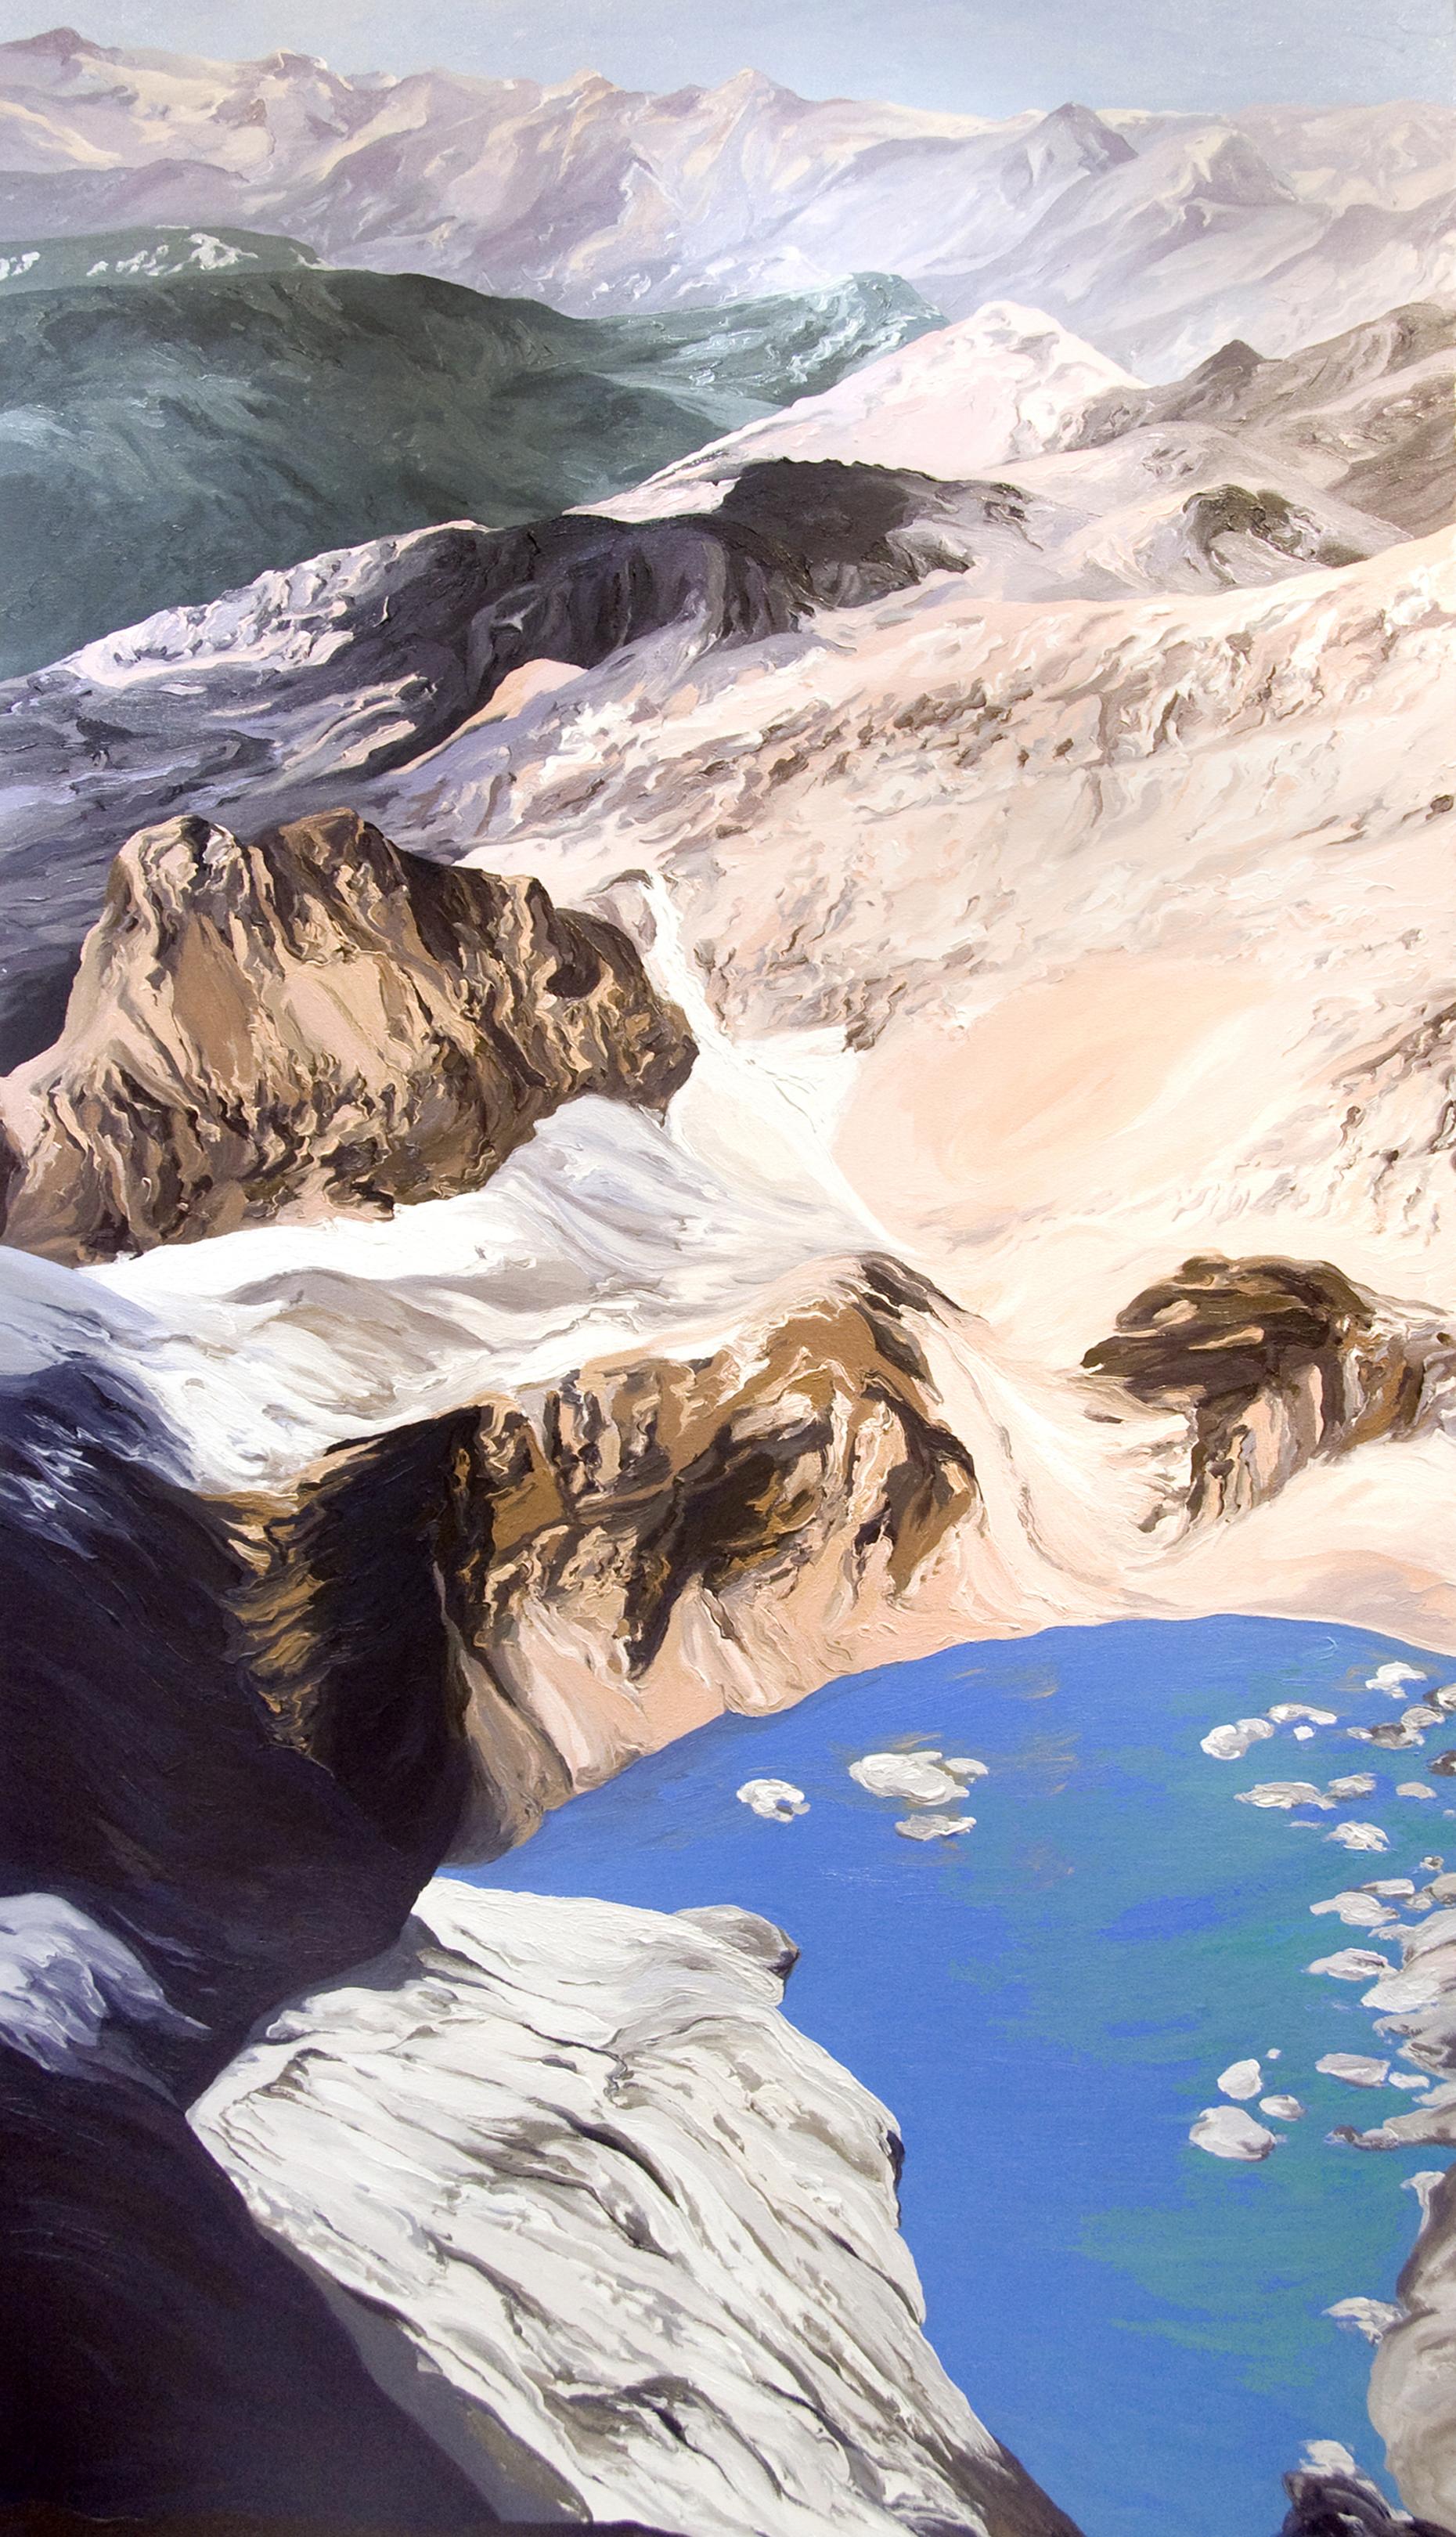 Grinnell Mt. Gould #3 1998 after Dan Fagre USGS